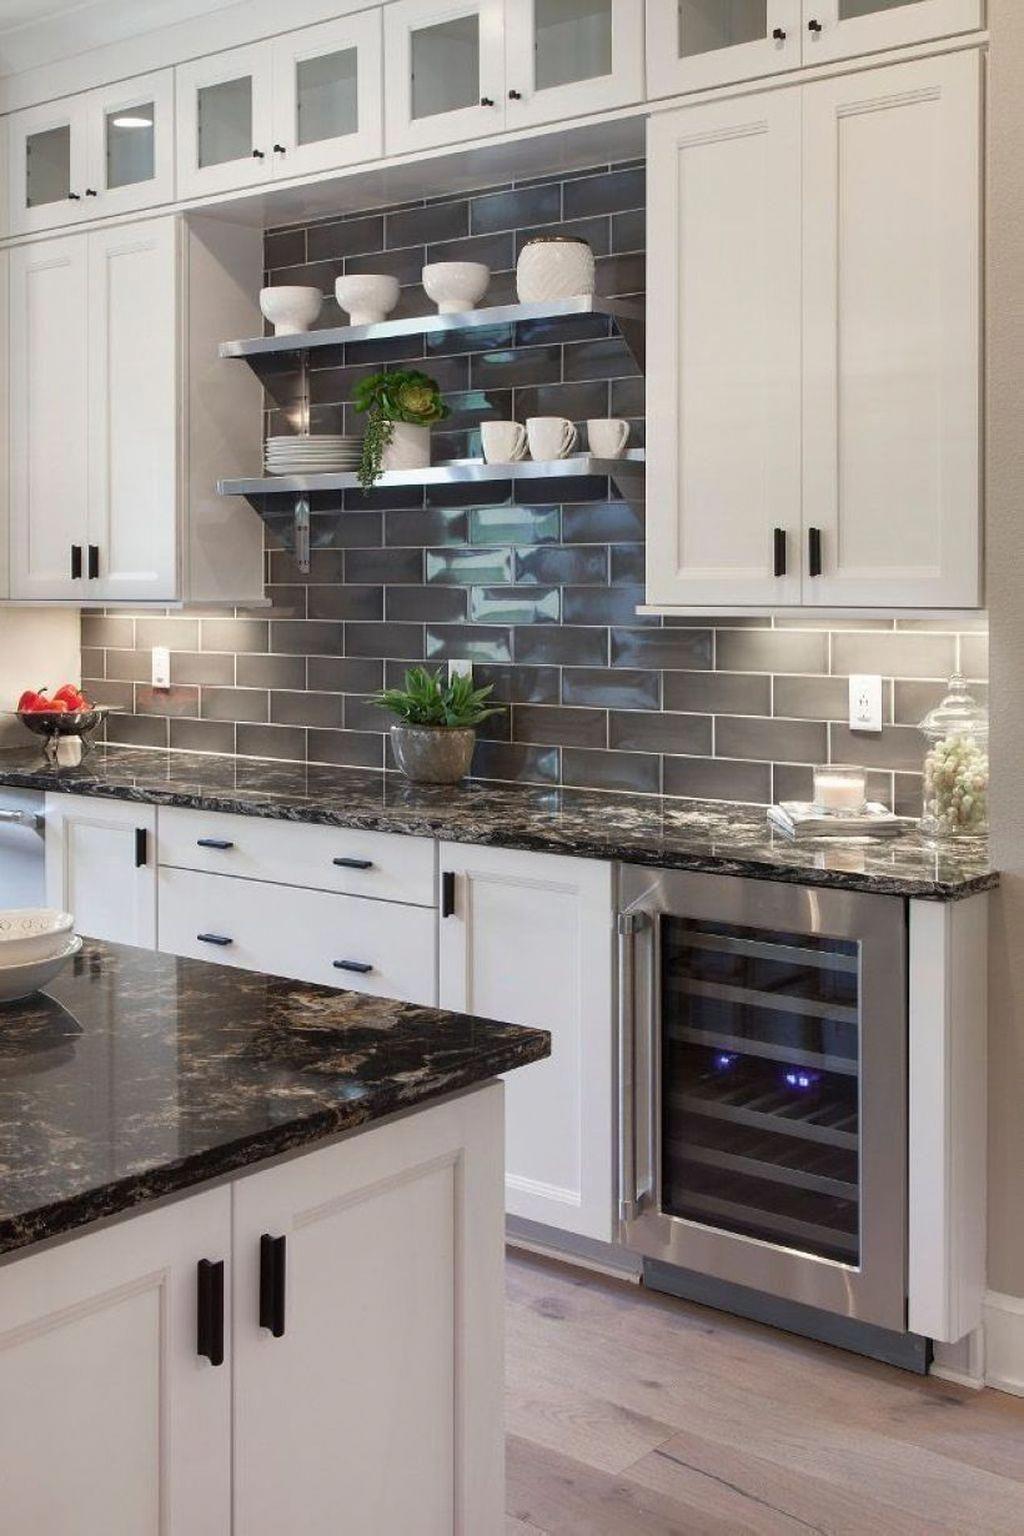 Find Out How To Design Your Own Kitchen Ideas We Have Given The Best 53 Best Kitchen In 2020 Kitchen Design Countertops Kitchen Backsplash Designs Kitchen Renovation